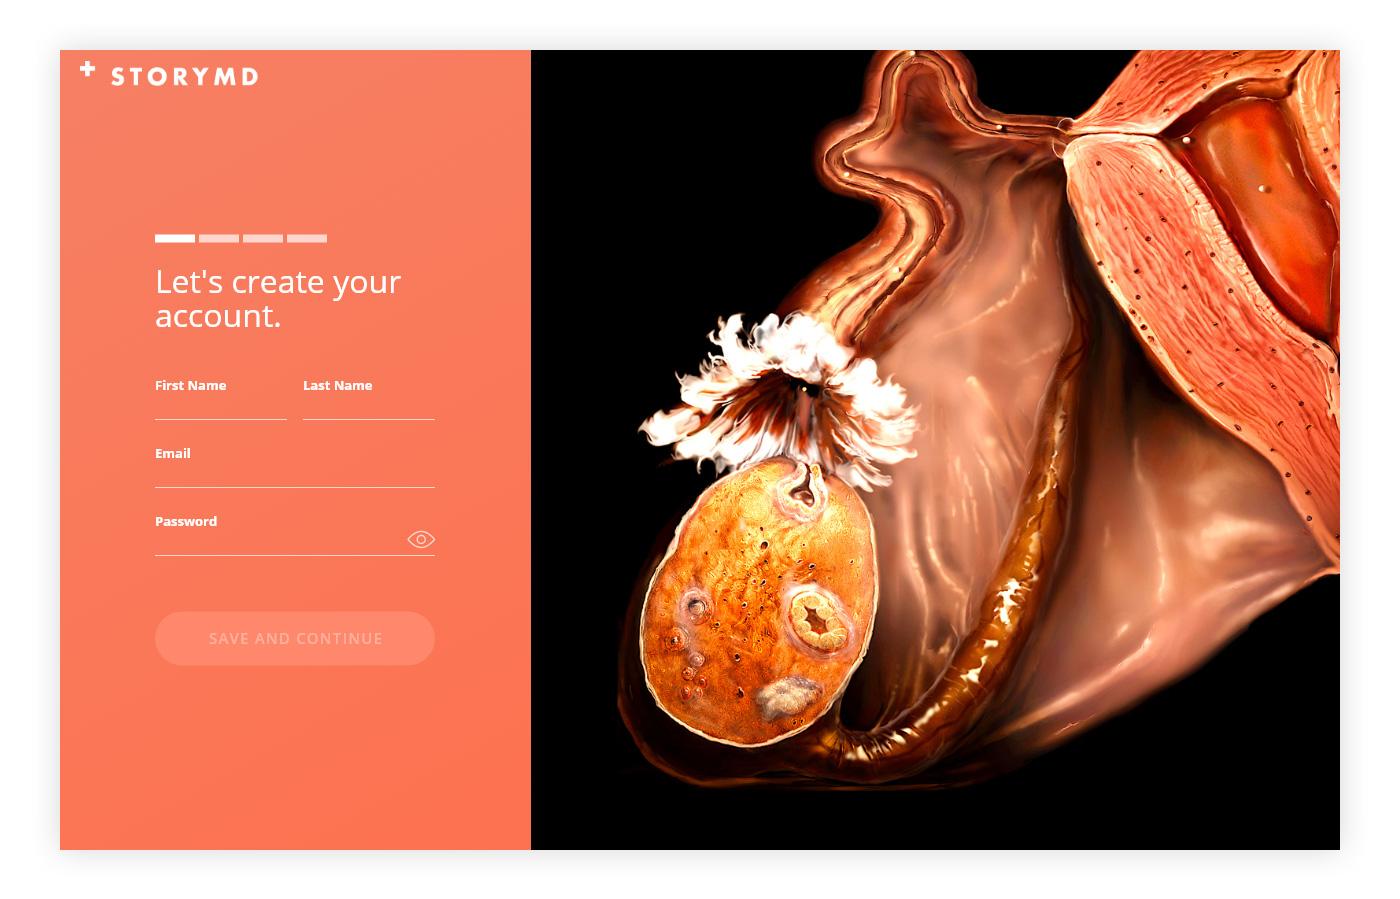 Health-App-Sign-Up-Screen-Design-StoryMD.jpg